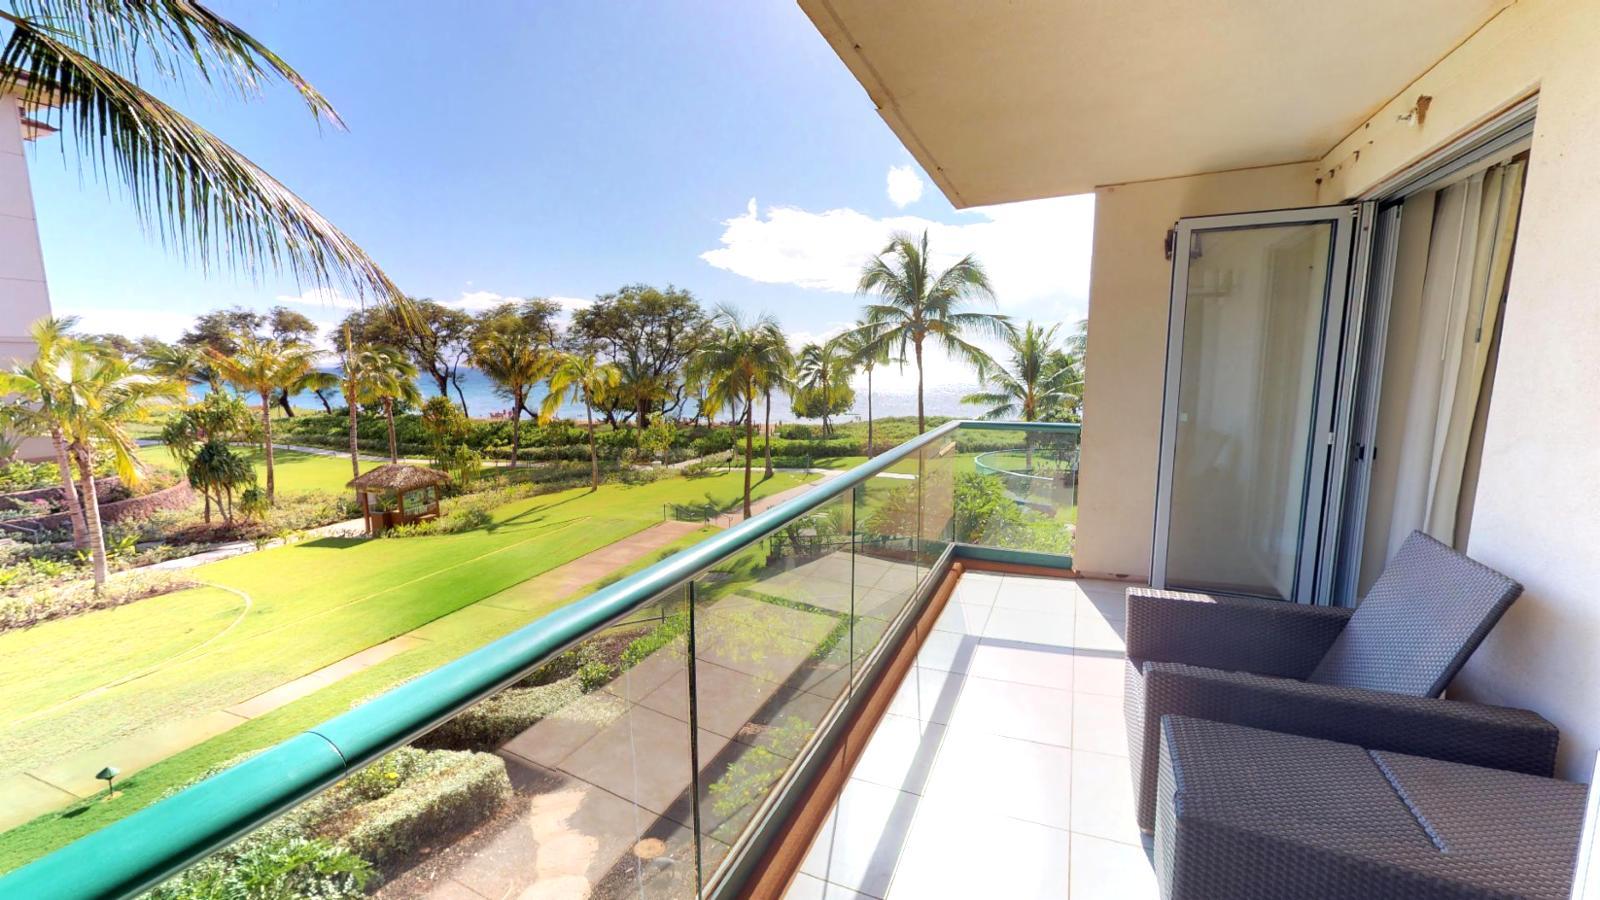 Large sunny and breezy balcony